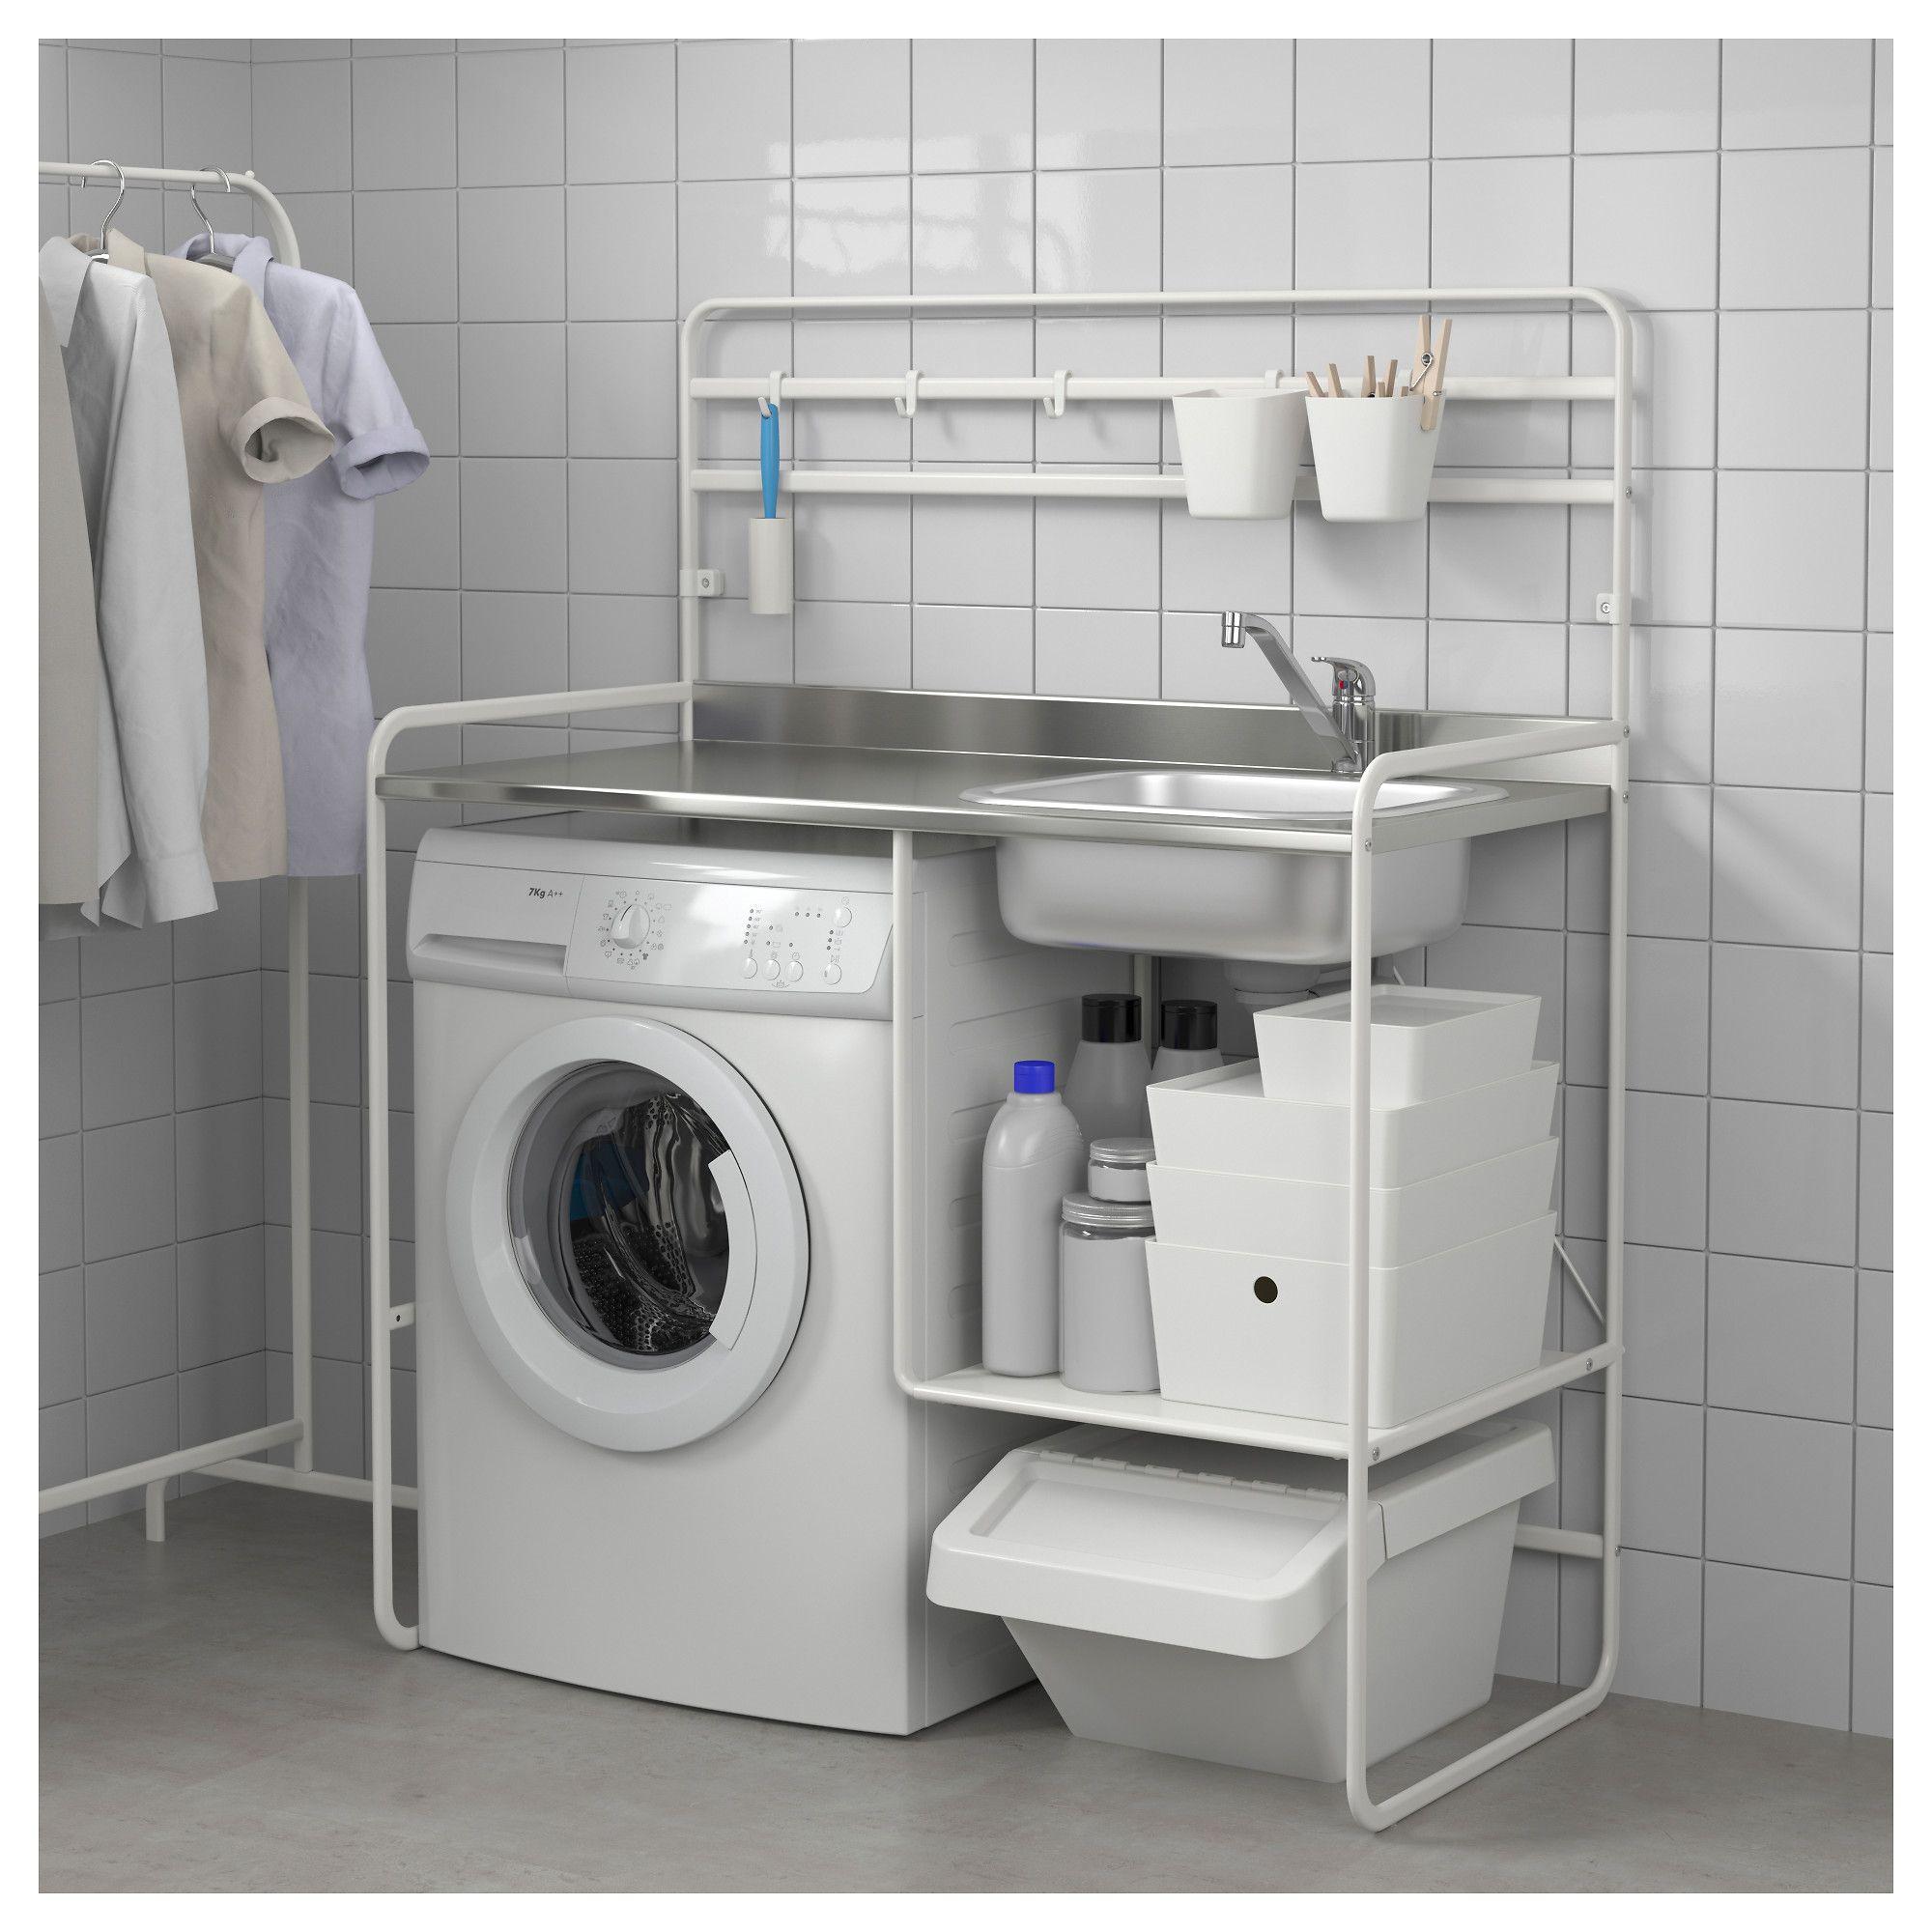 IKEA - SUNNERSTA Mini-kitchen | Lavanderia | Arredamento lavanderia ...